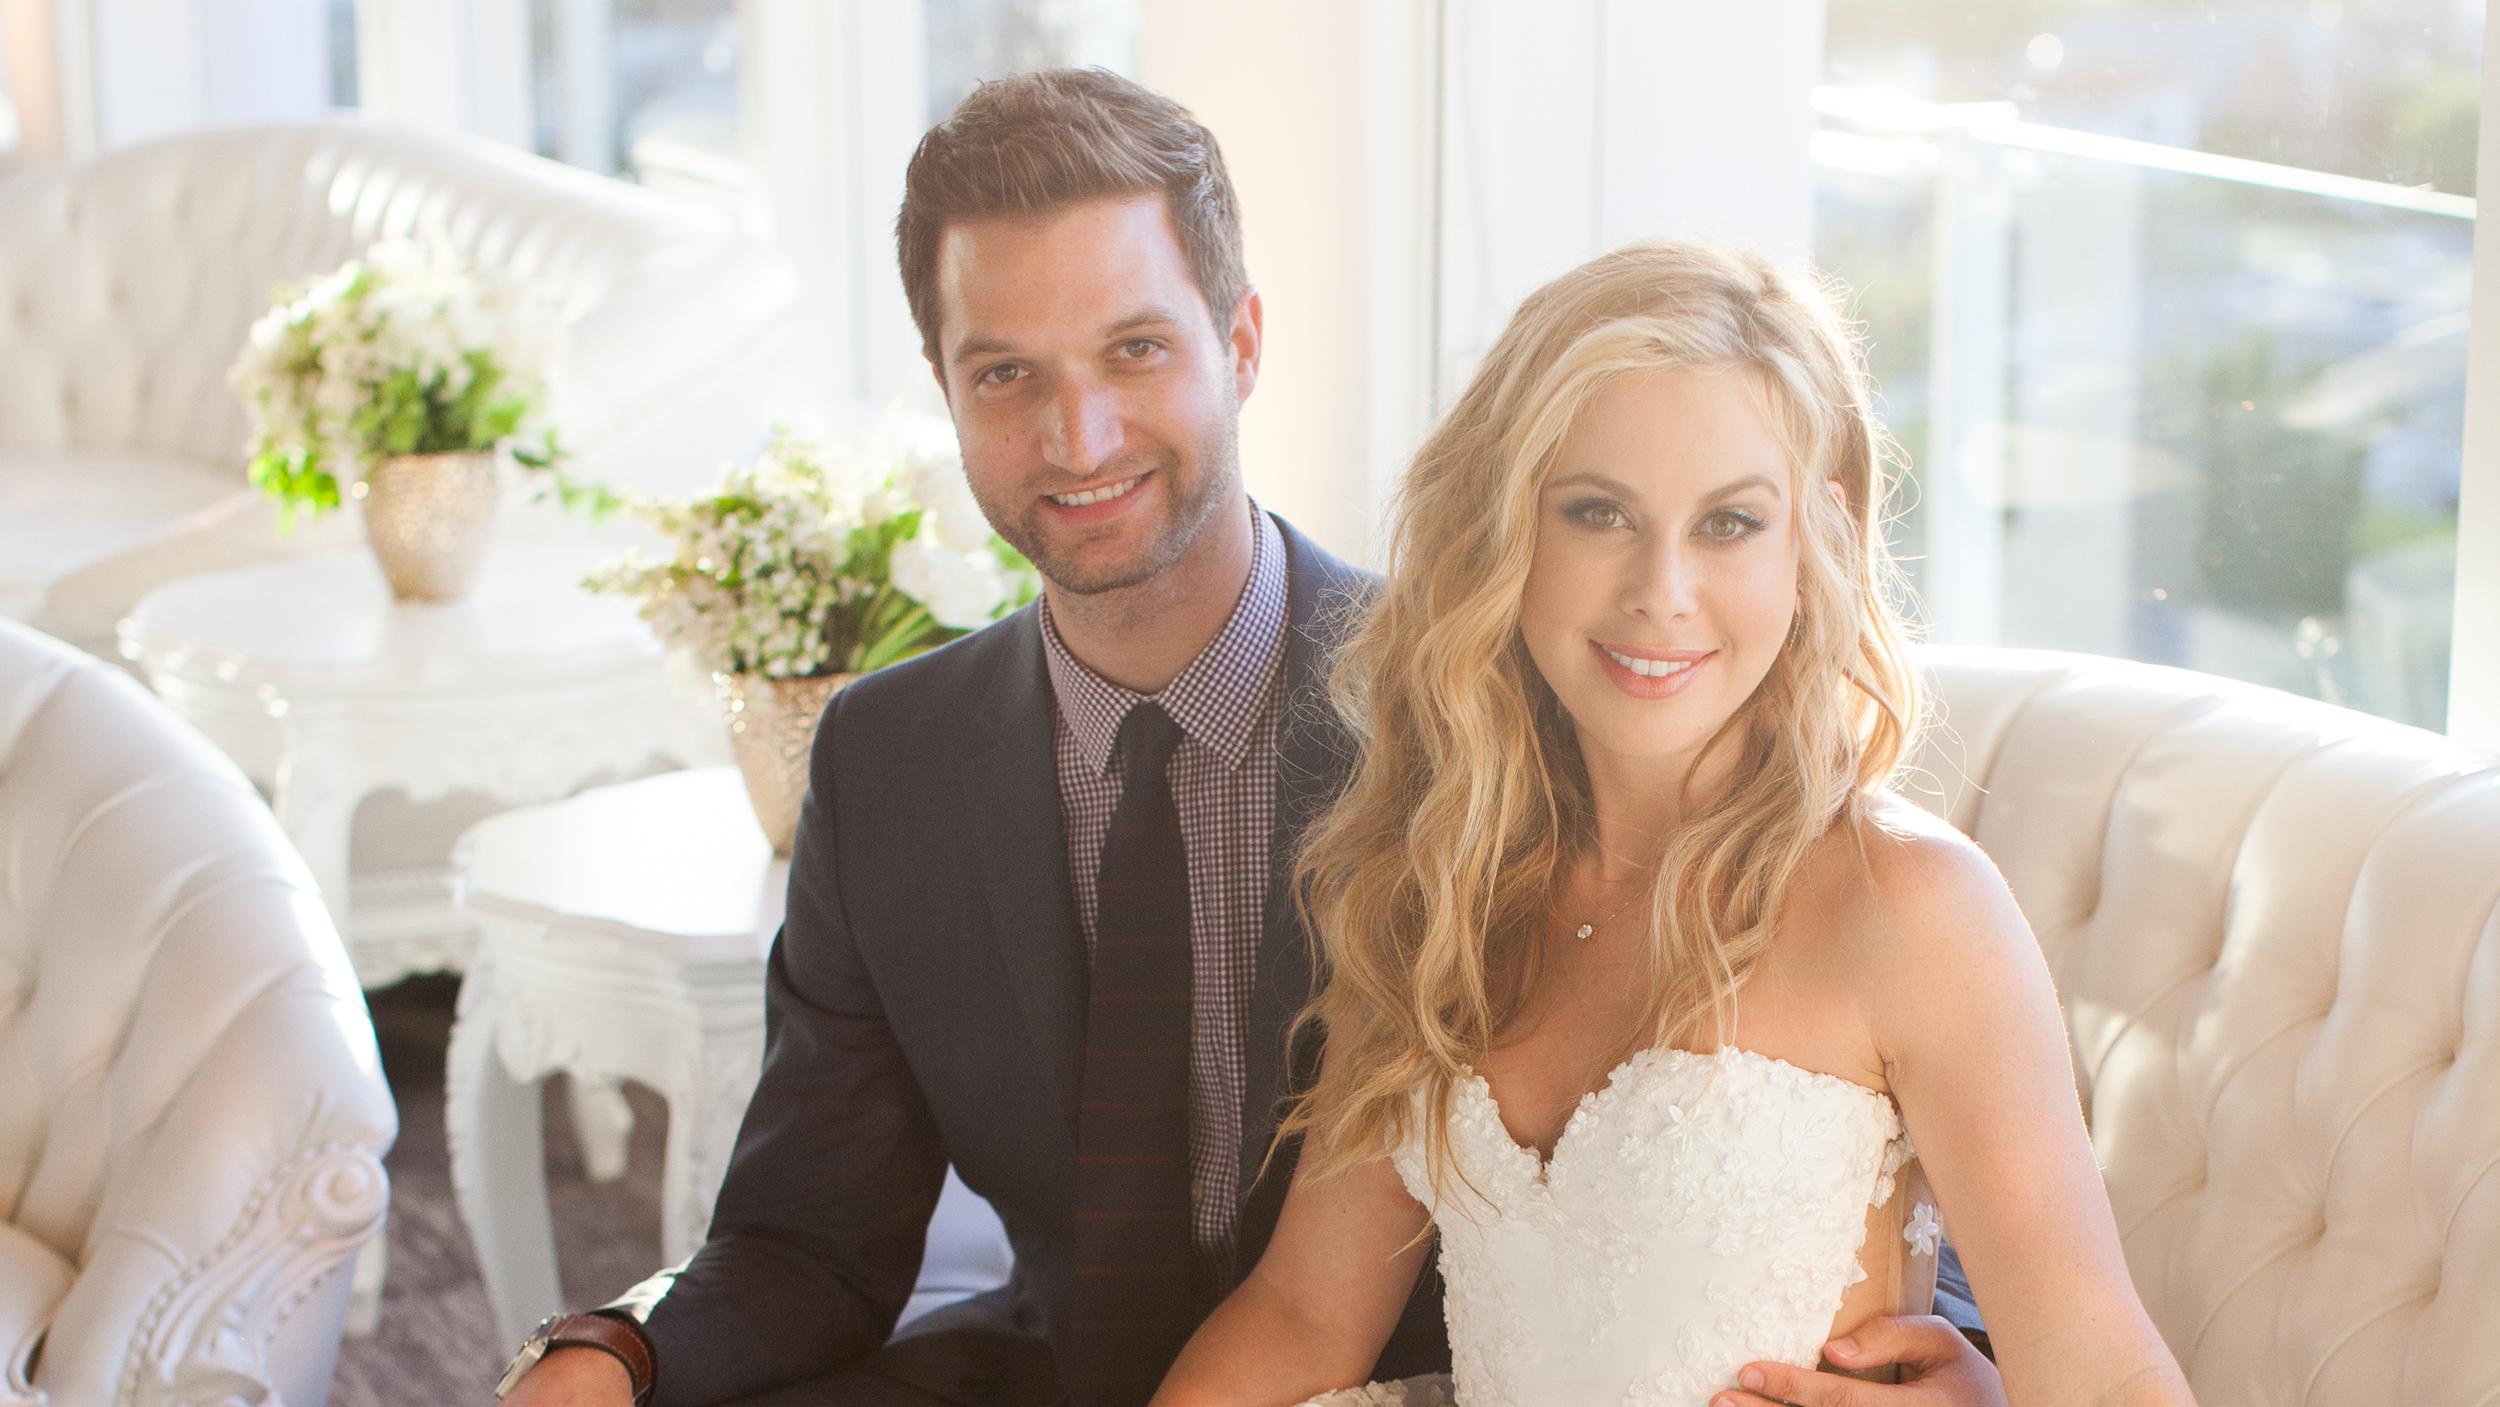 Tara Lipinski Todd Kapostasy Celebrate At Engagement